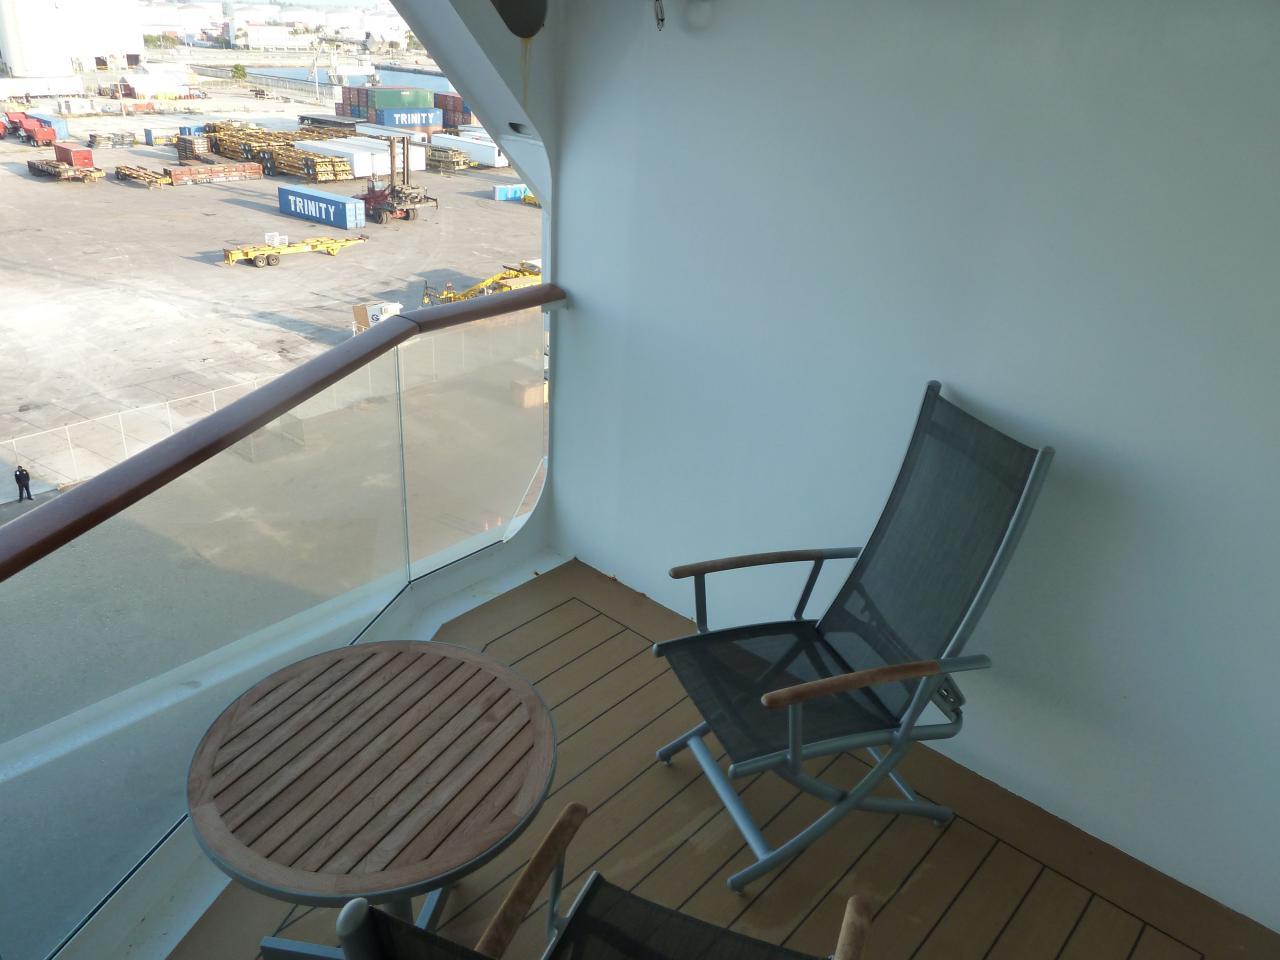 Solstice stateroom 8334 - Celebrity Cruises - Cruise ...